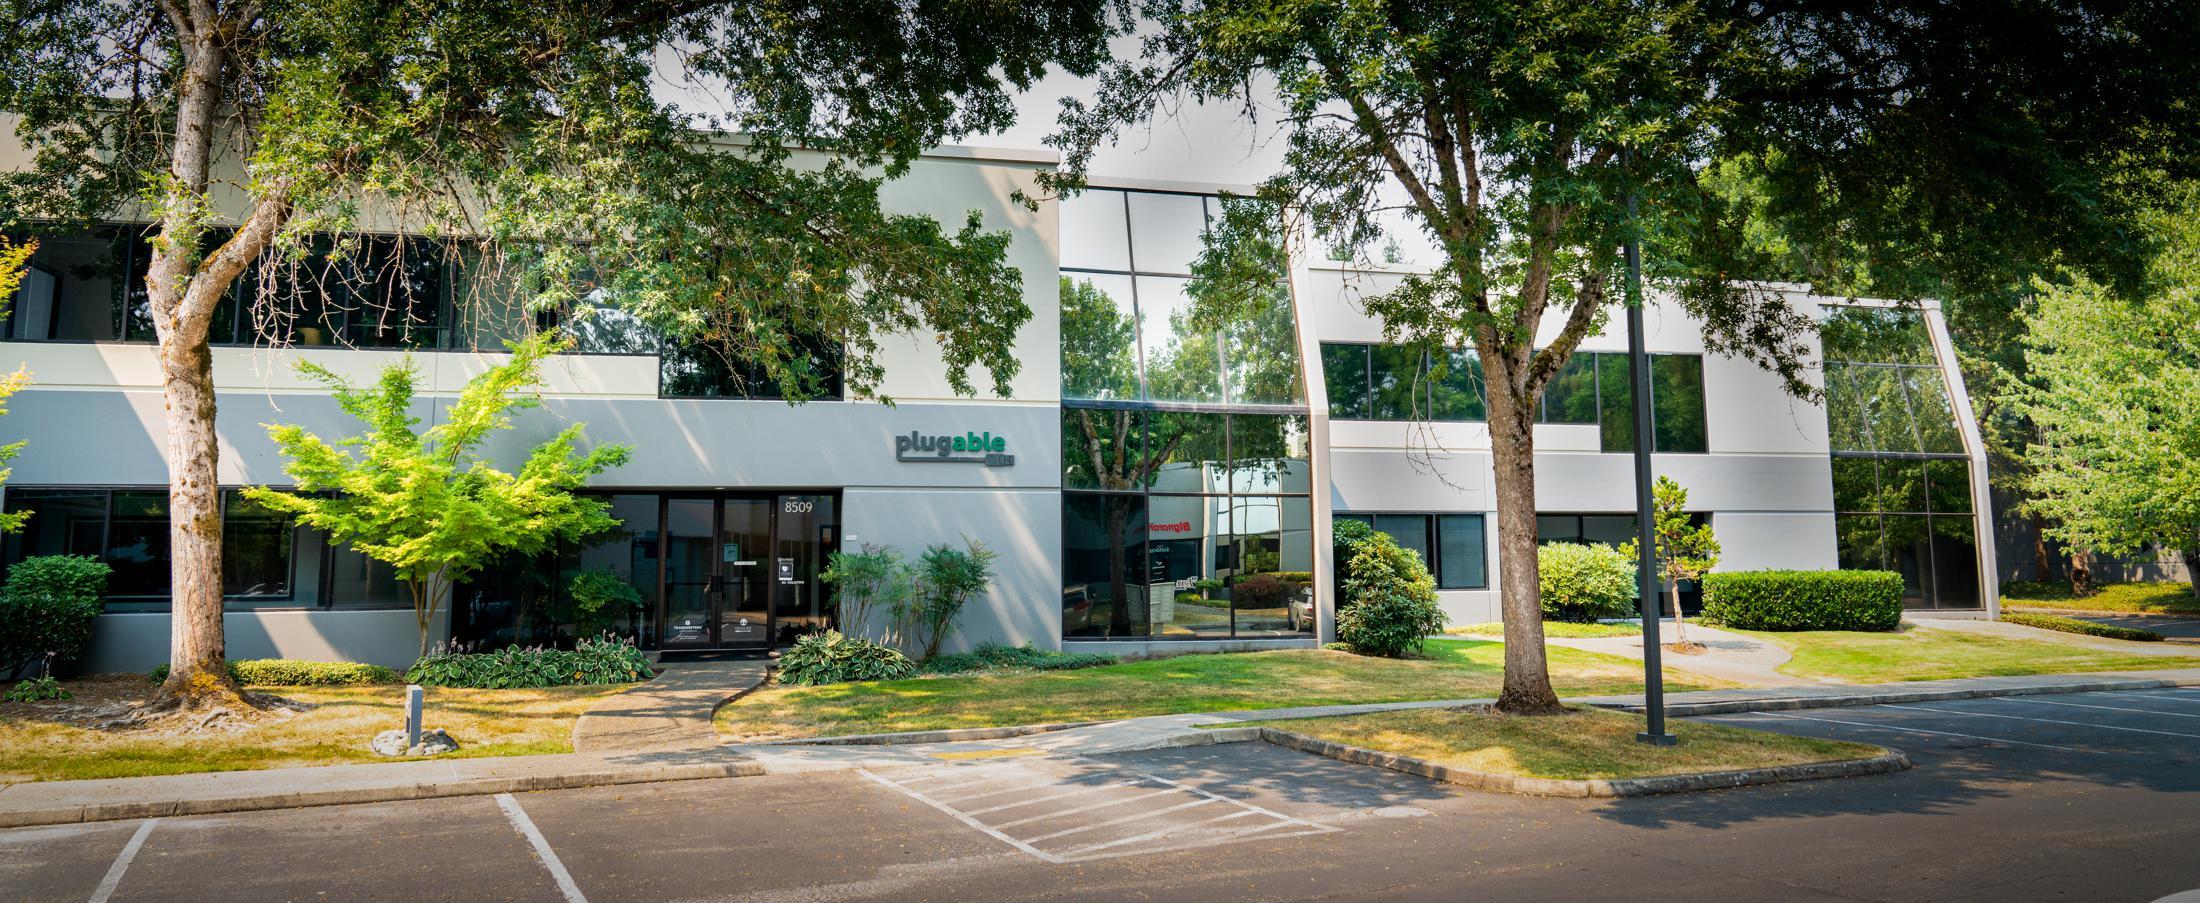 Plugable 2021 company office photo